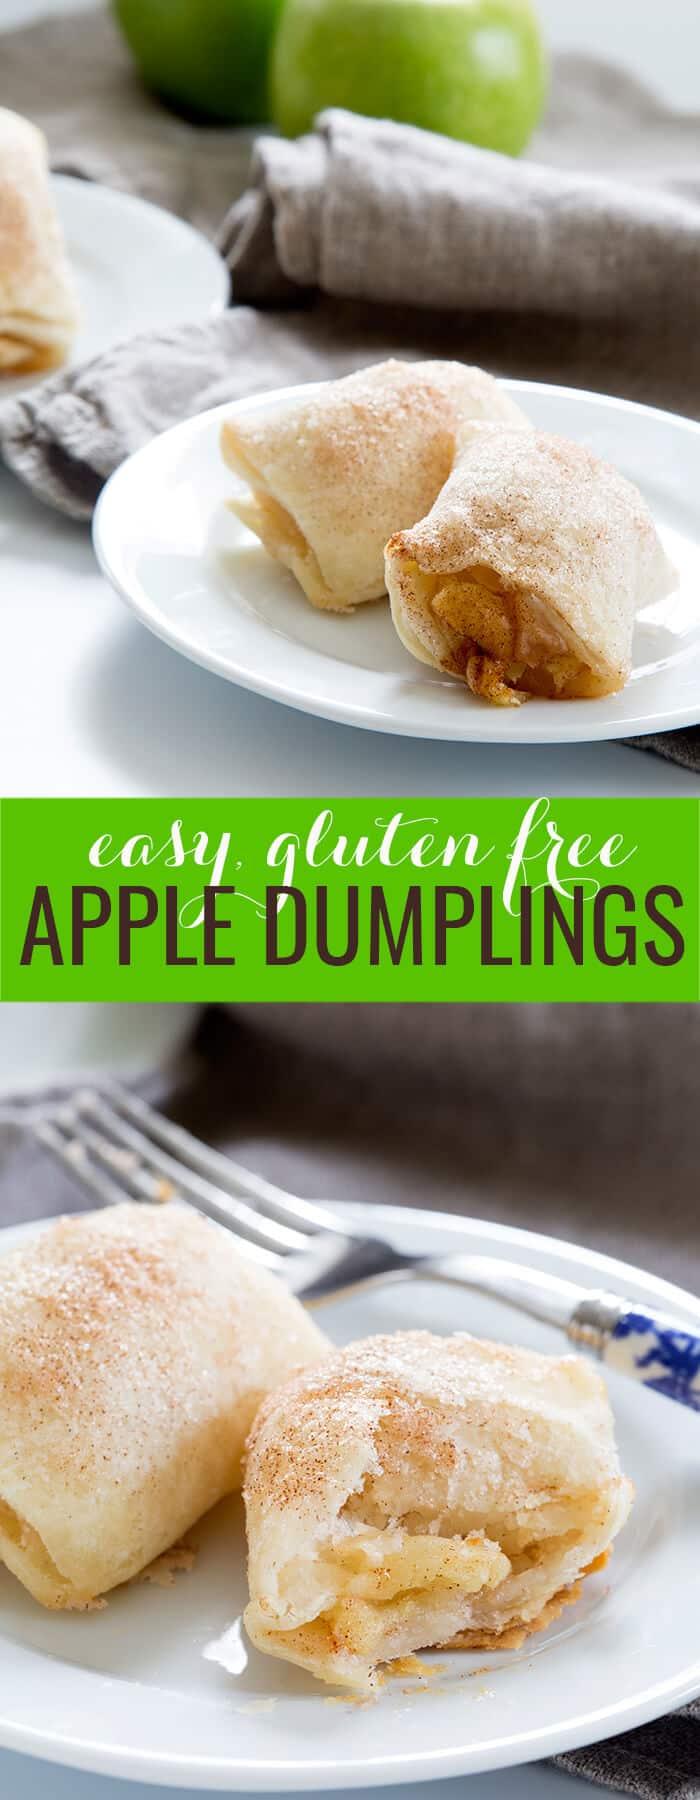 2 apple dumplings on a plate and part of an apple dumpling with a fork below